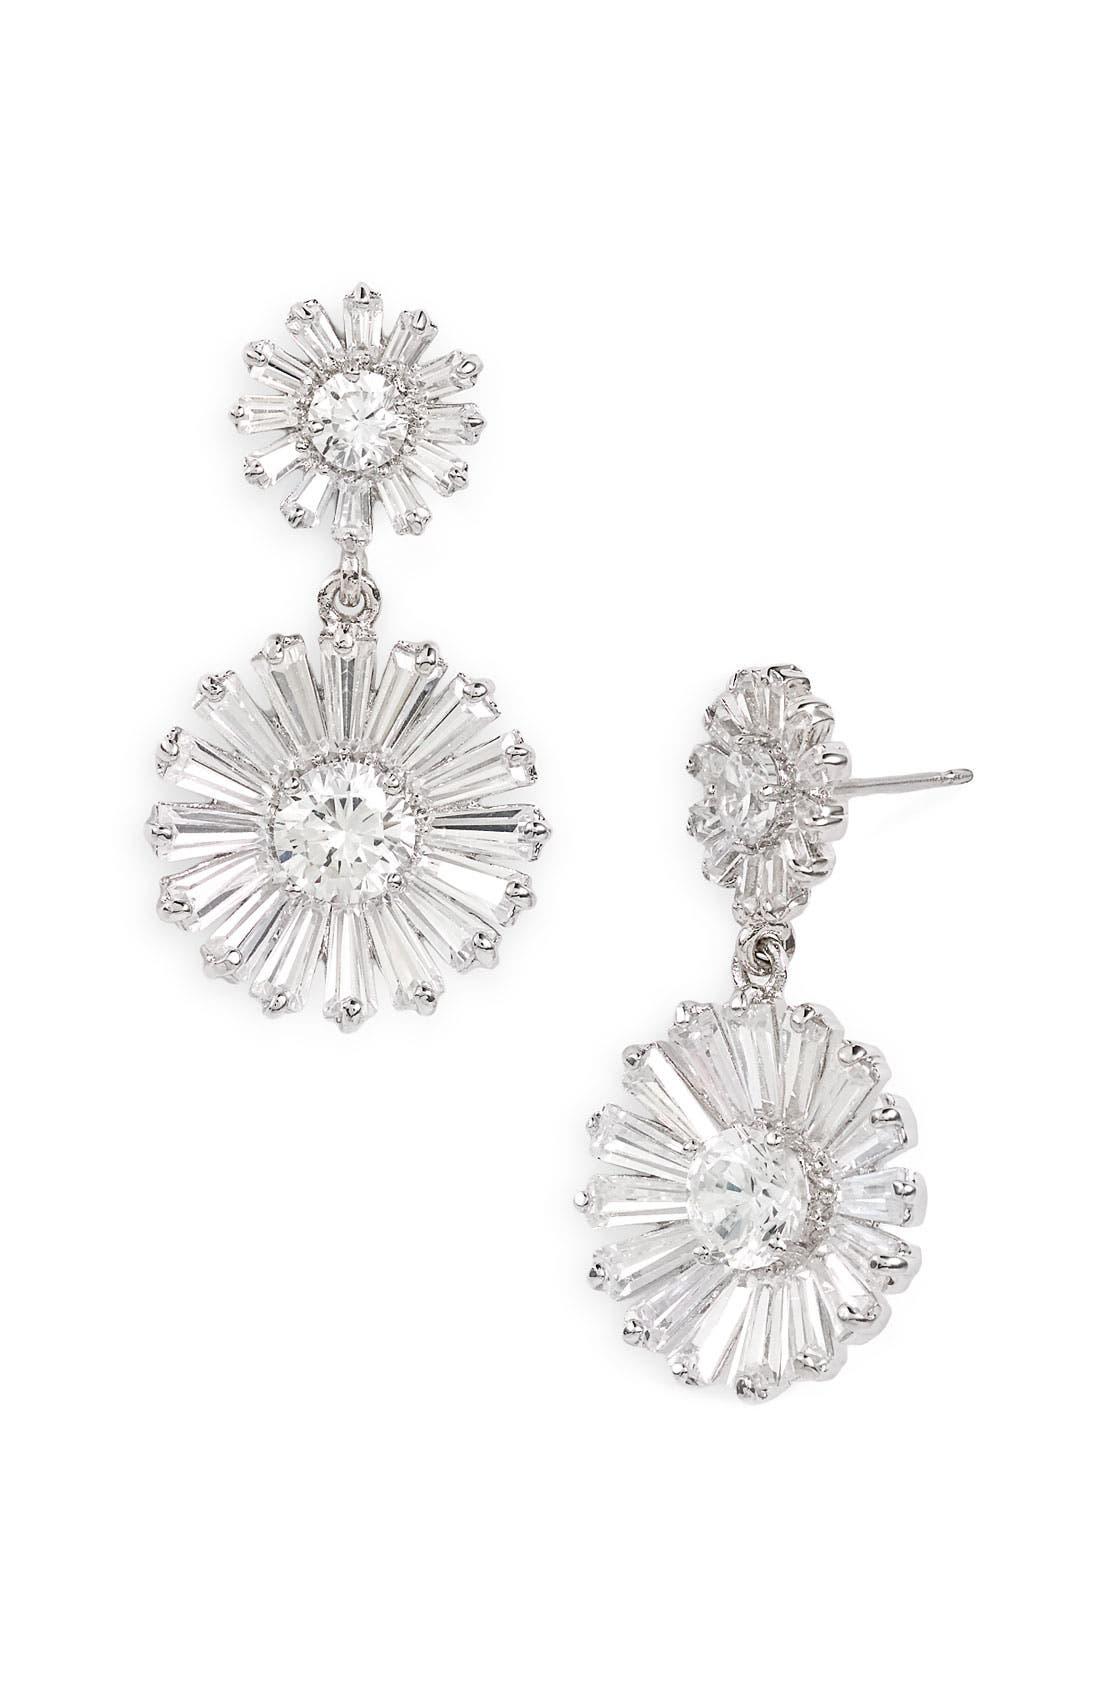 Main Image - kate spade new york 'crystal gardens' drop earrings